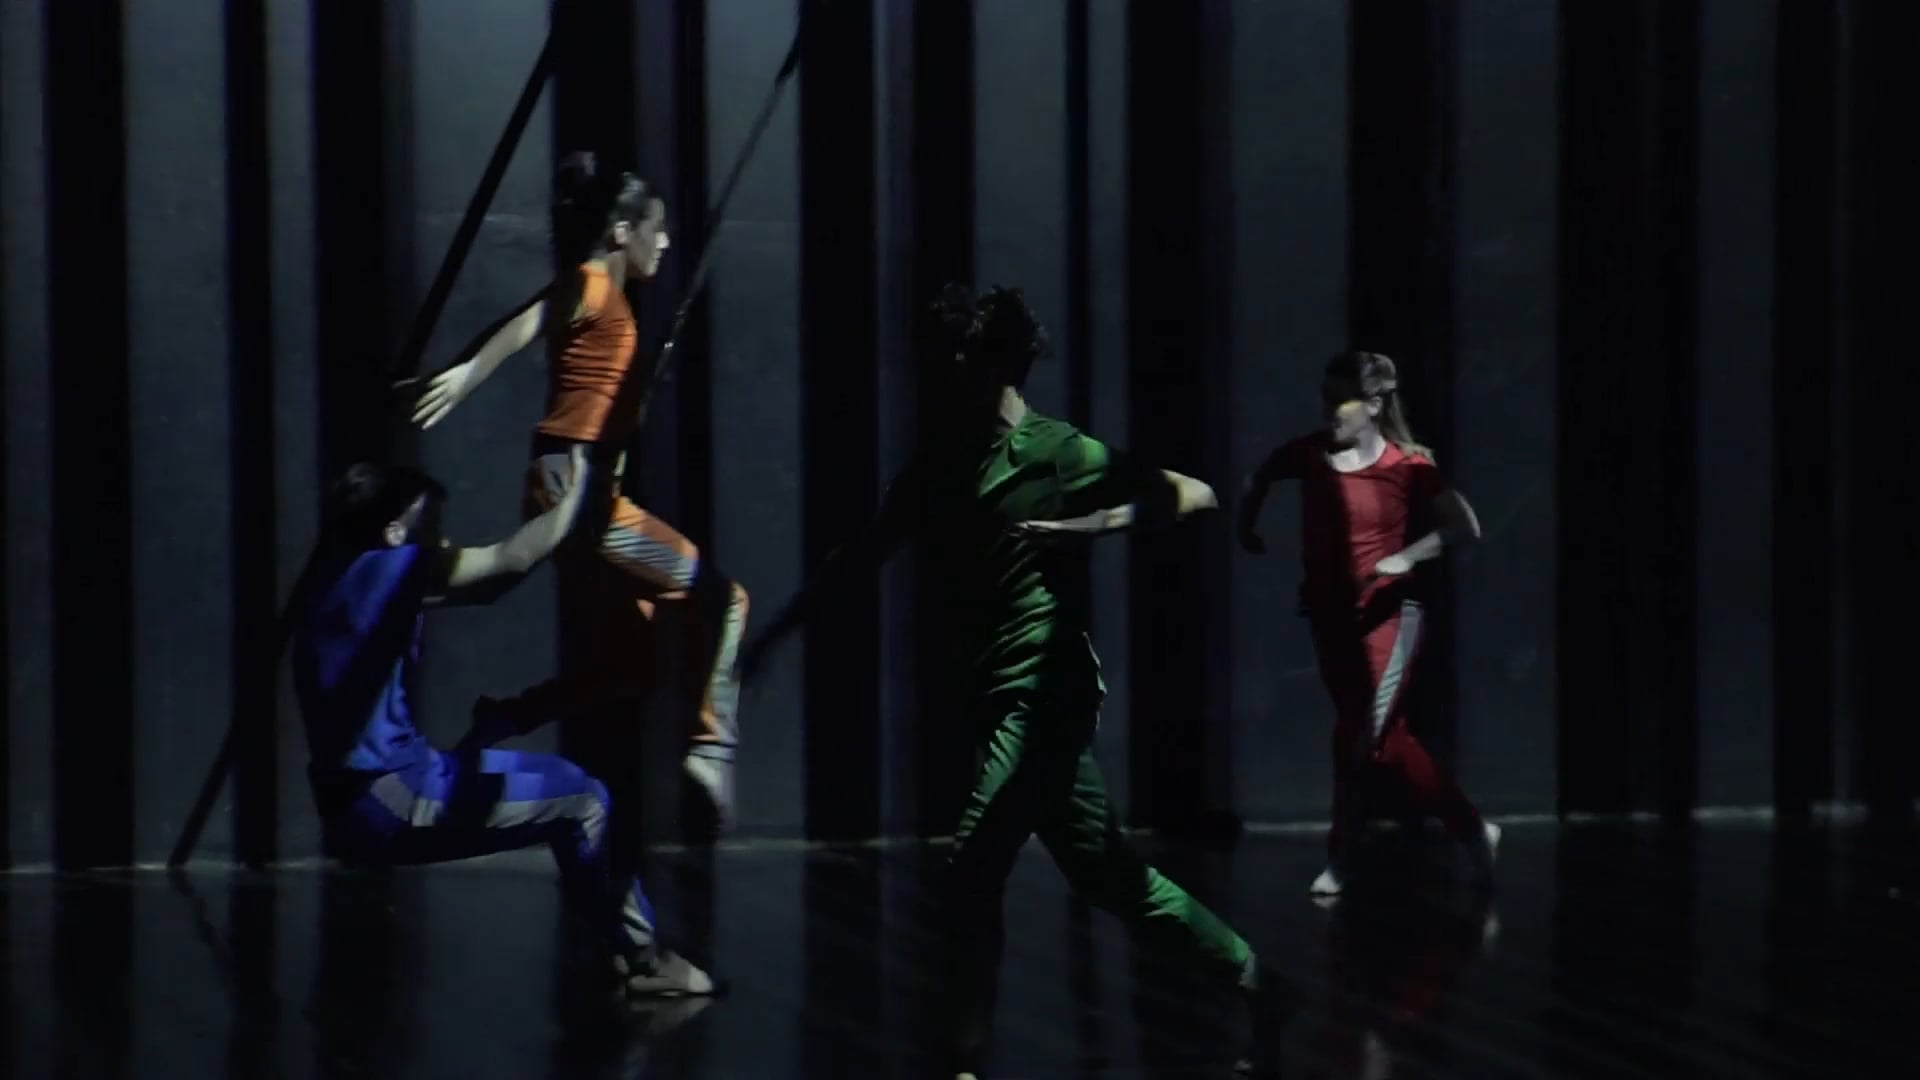 Trailer MOVI Aerial dance, video animation